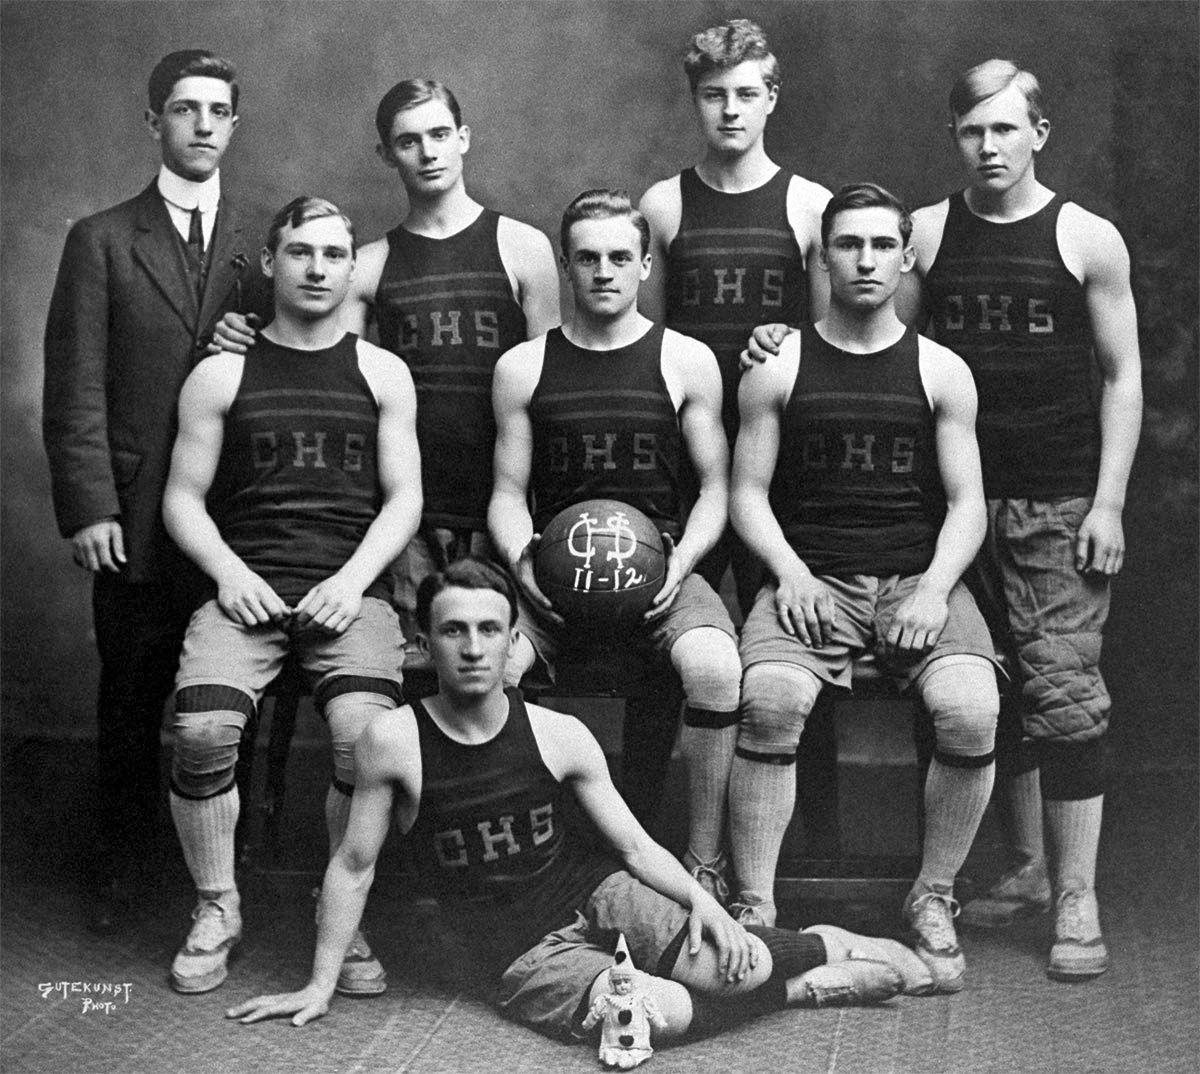 The Central High School, Philadelphia PA, basketball team